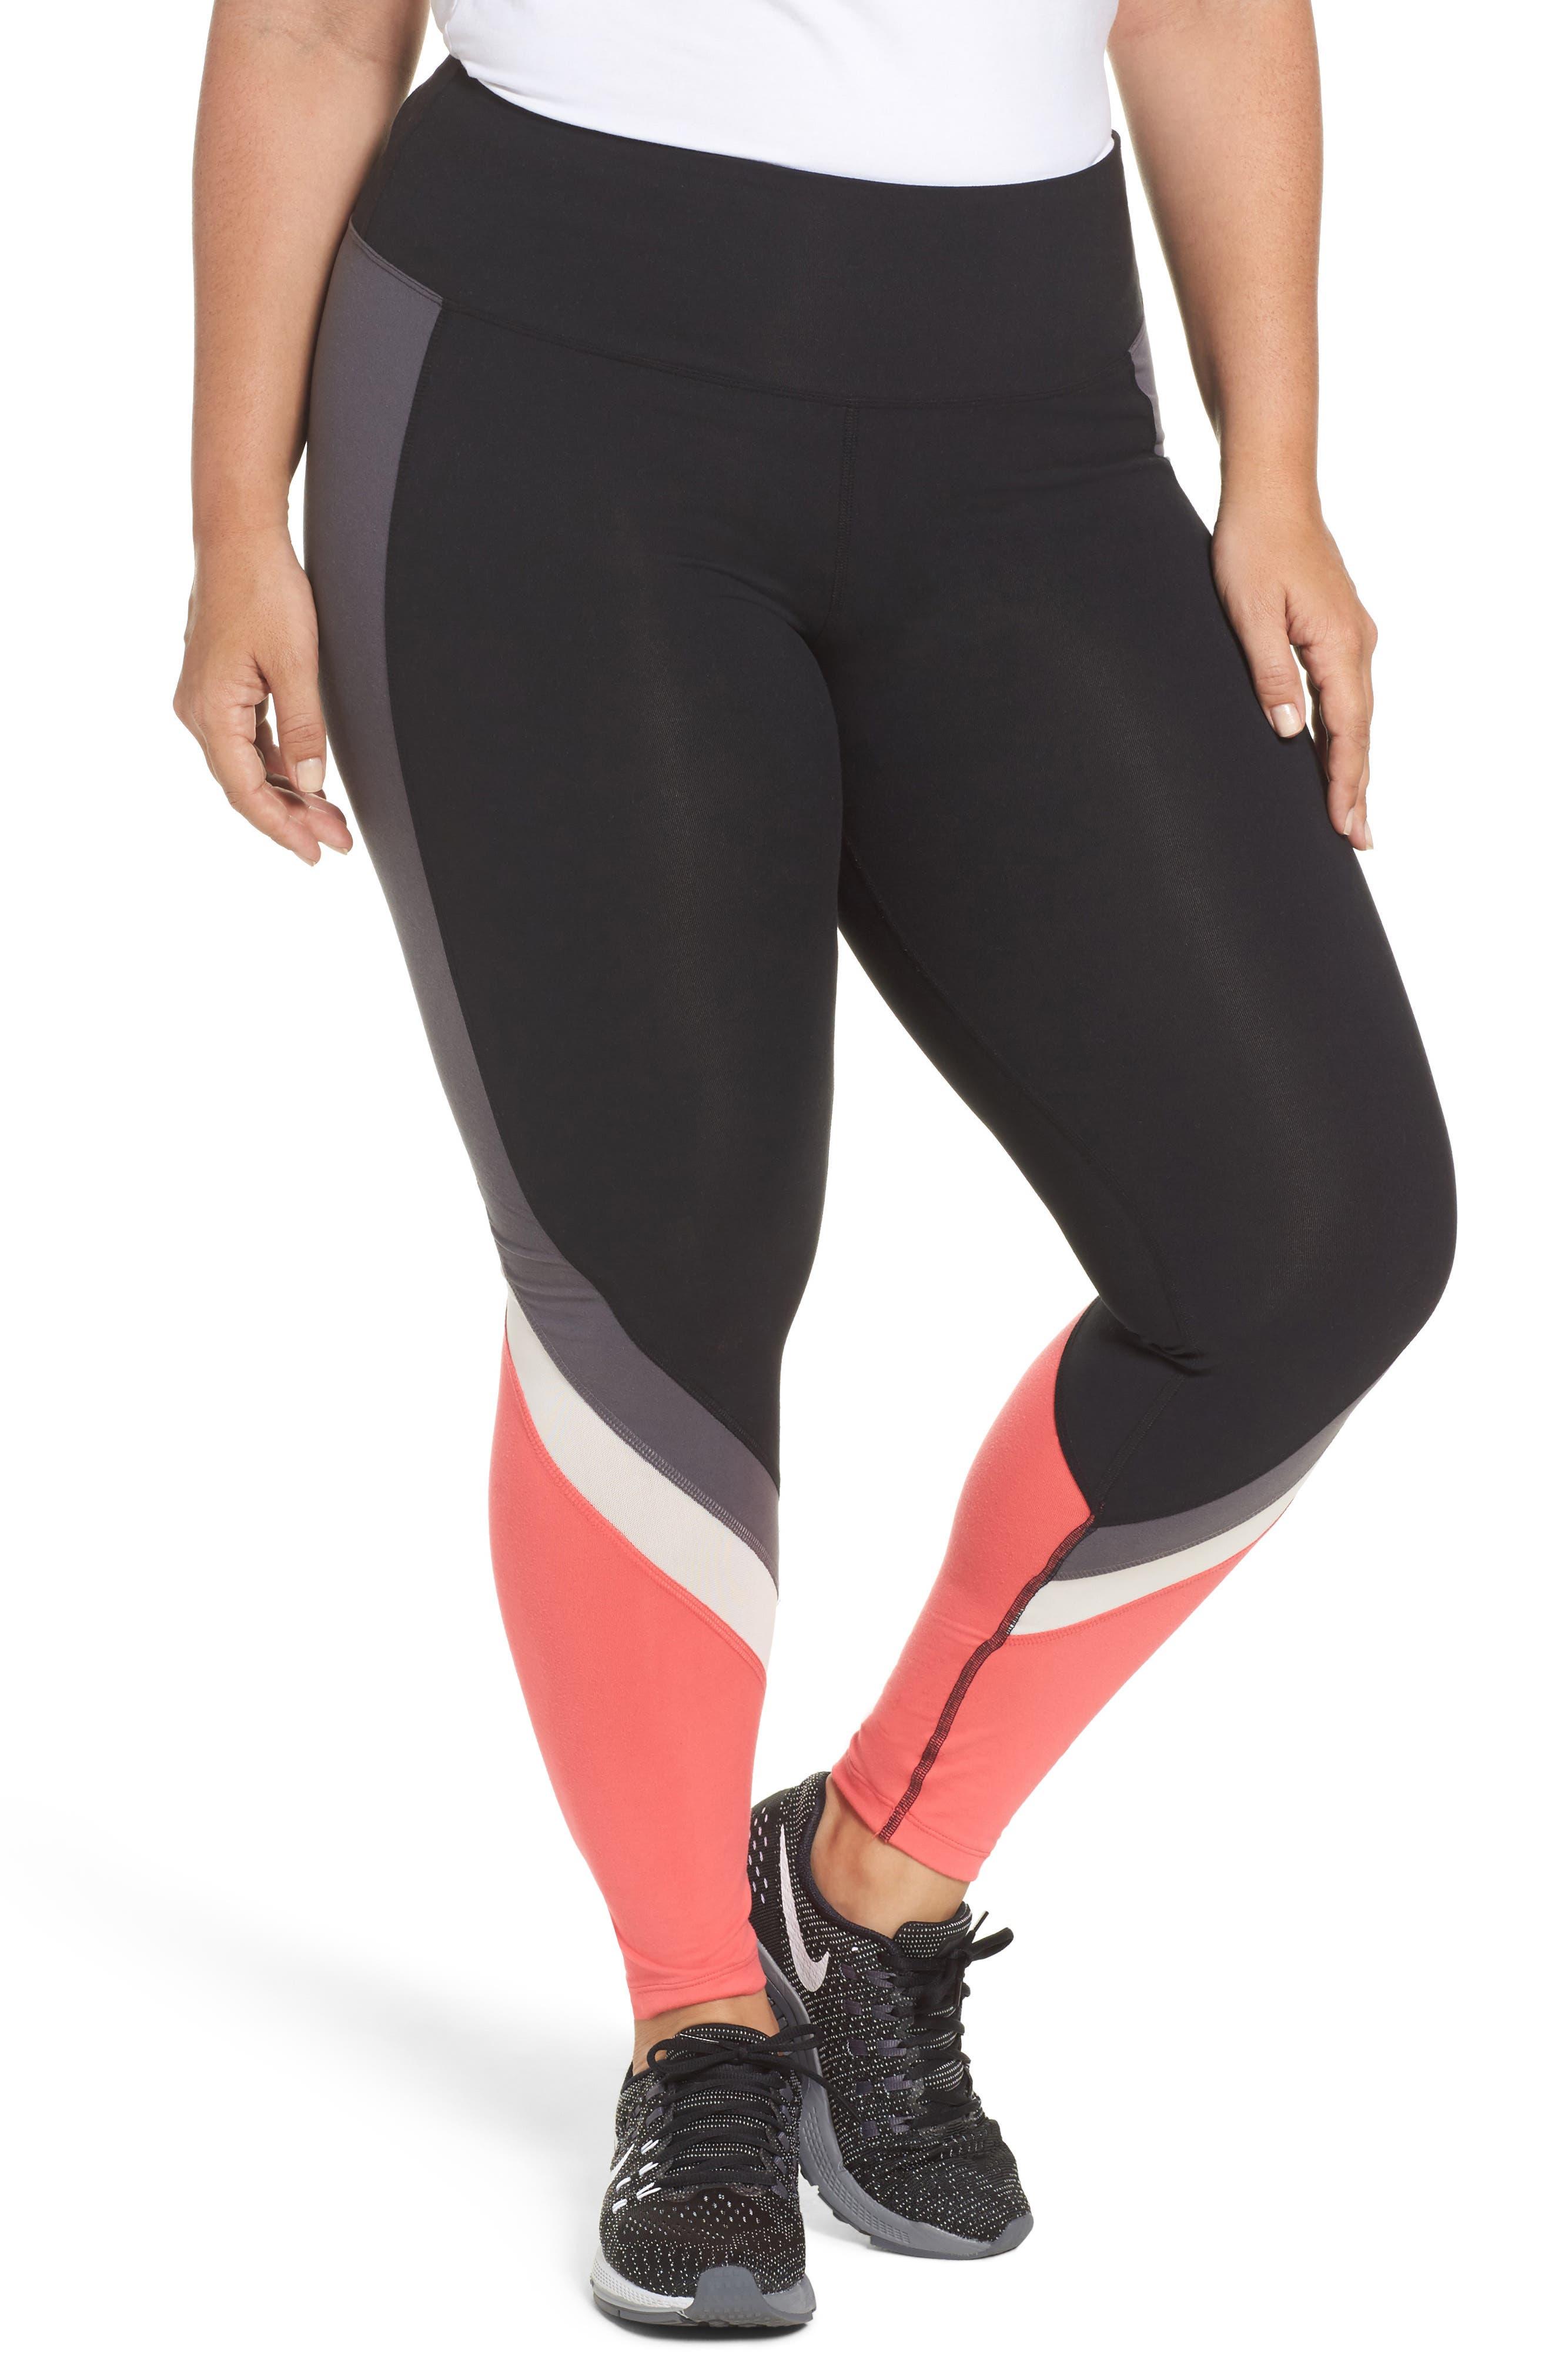 Alternate Image 1 Selected - Marika Curves Colorblock Leggings (Plus Size)